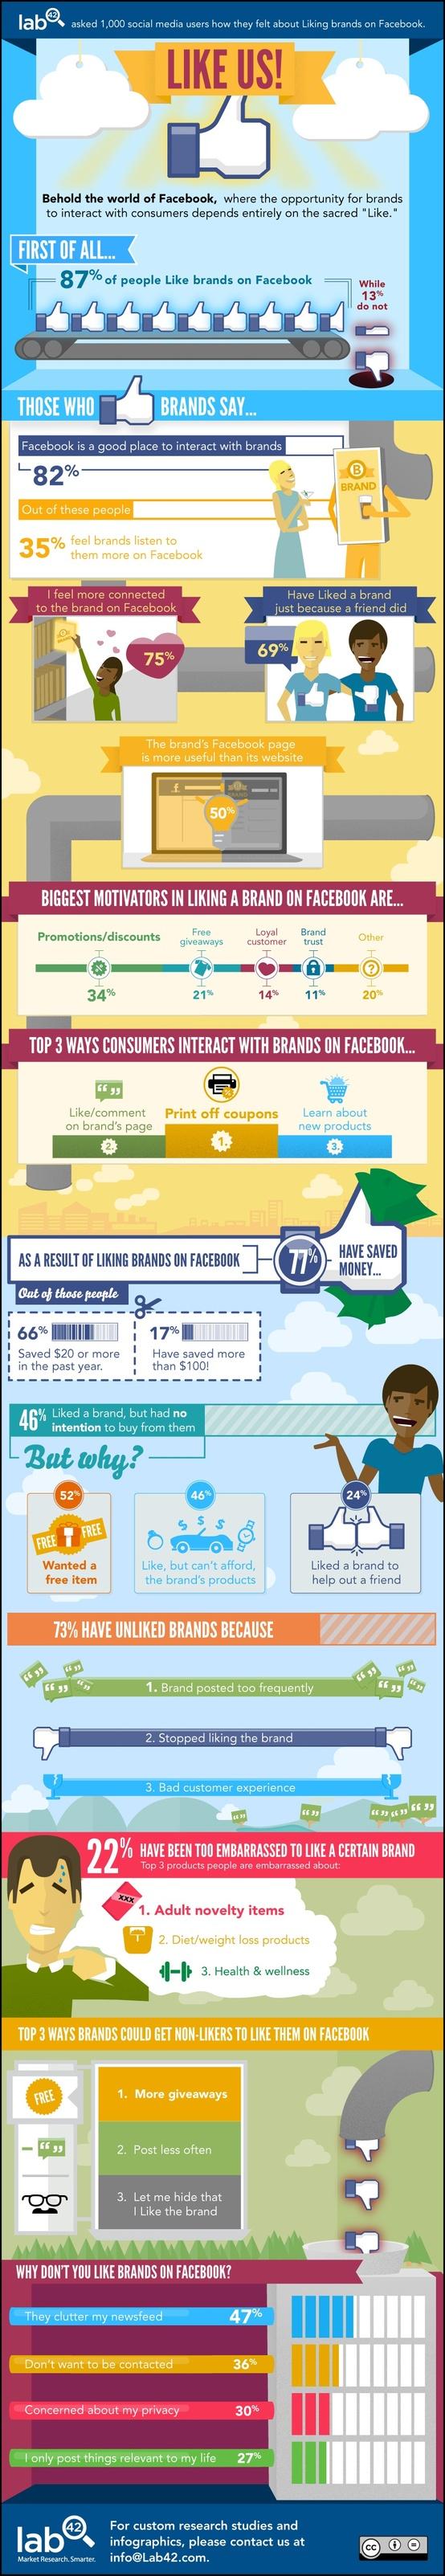 Like Us Infographic.jpg